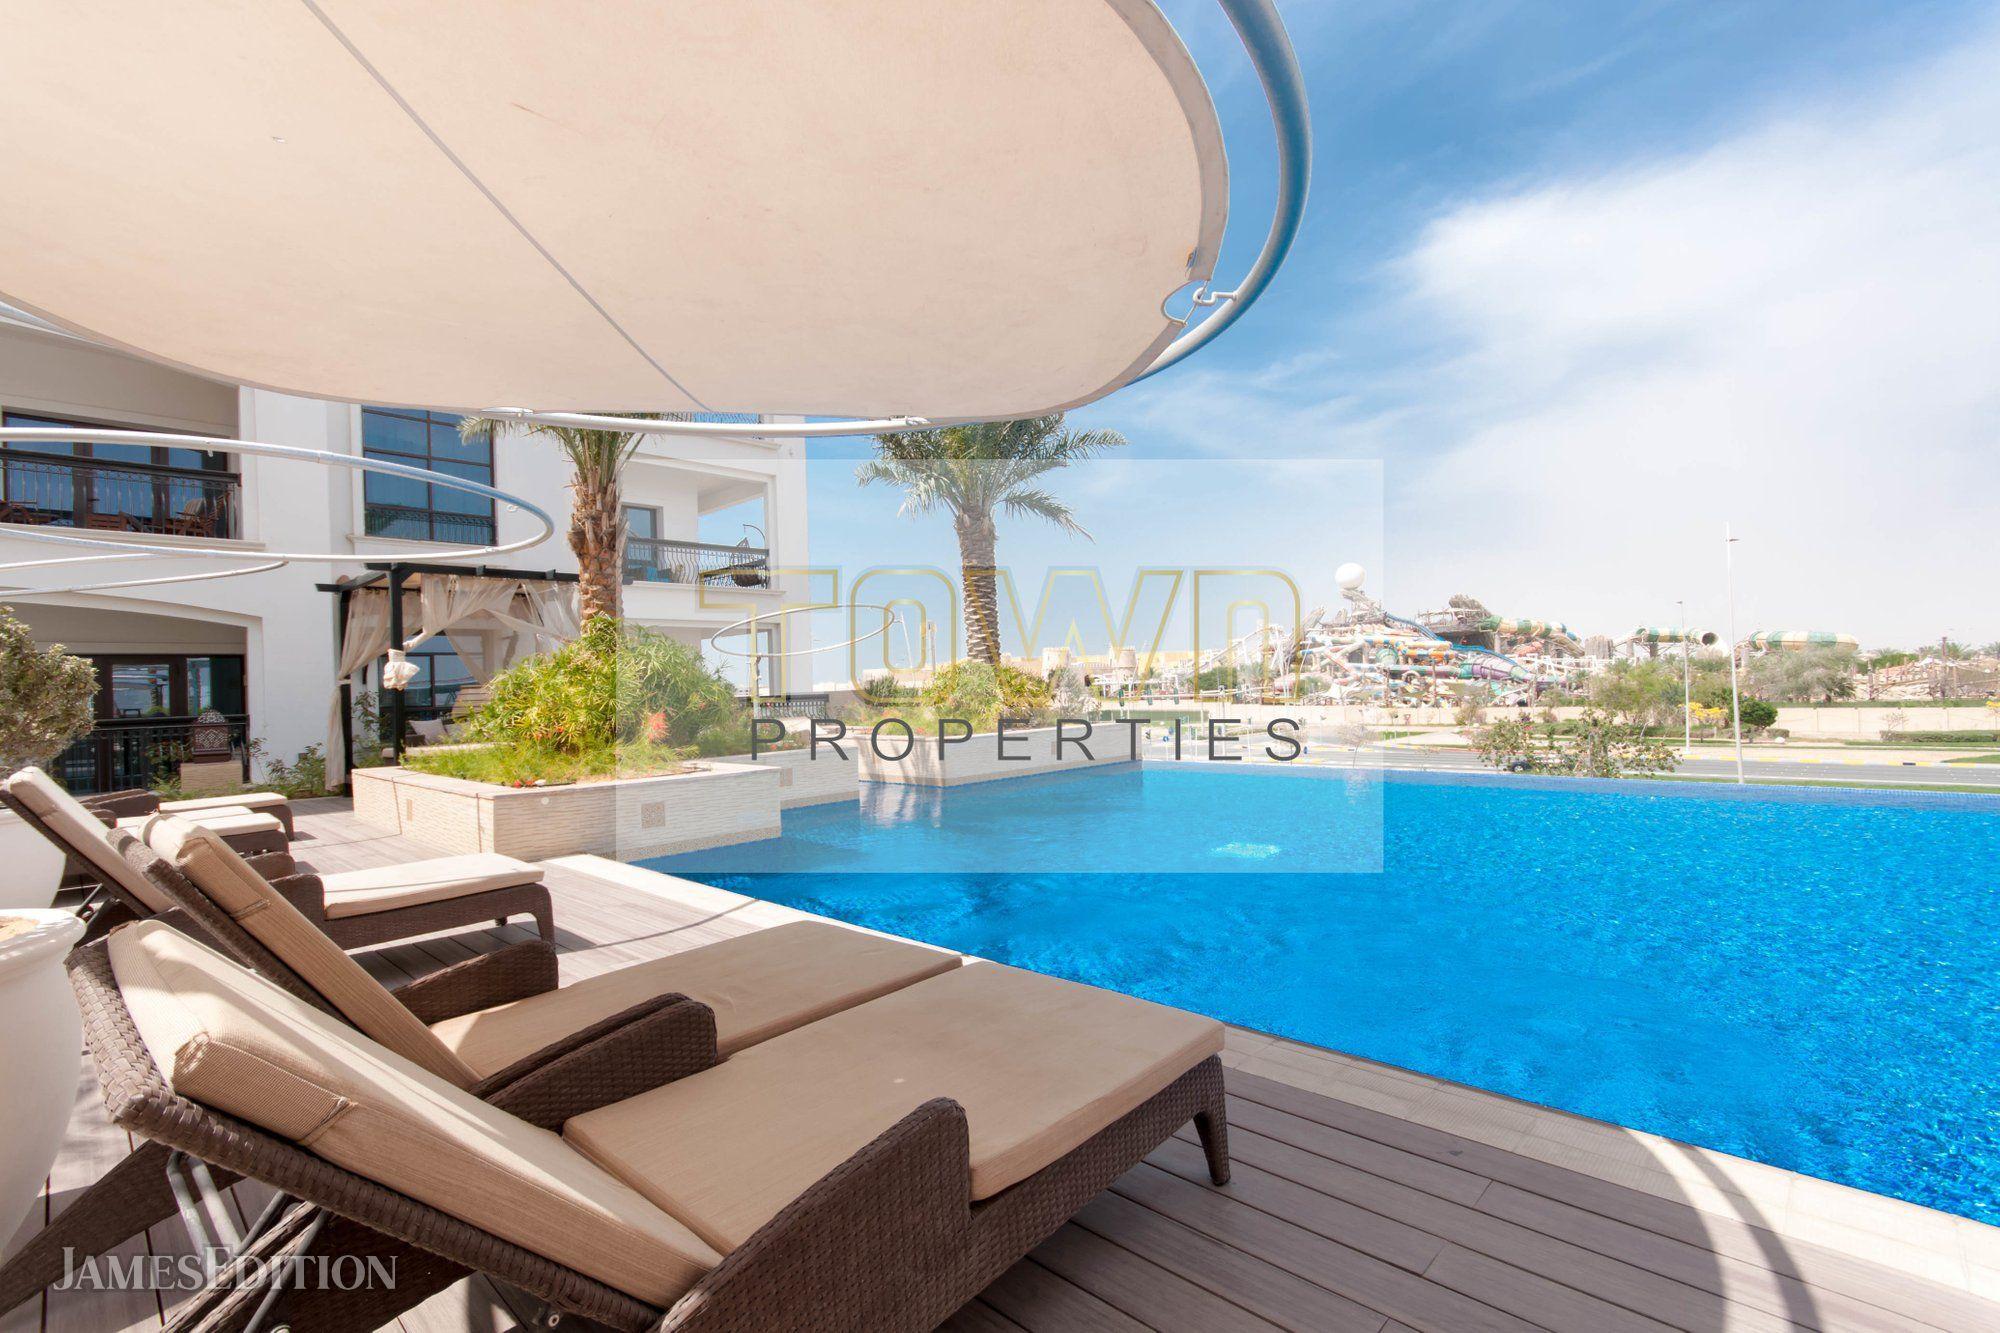 Apartment in Abu Dhabi, Abu Dhabi, United Arab Emirates 1 - 10748866